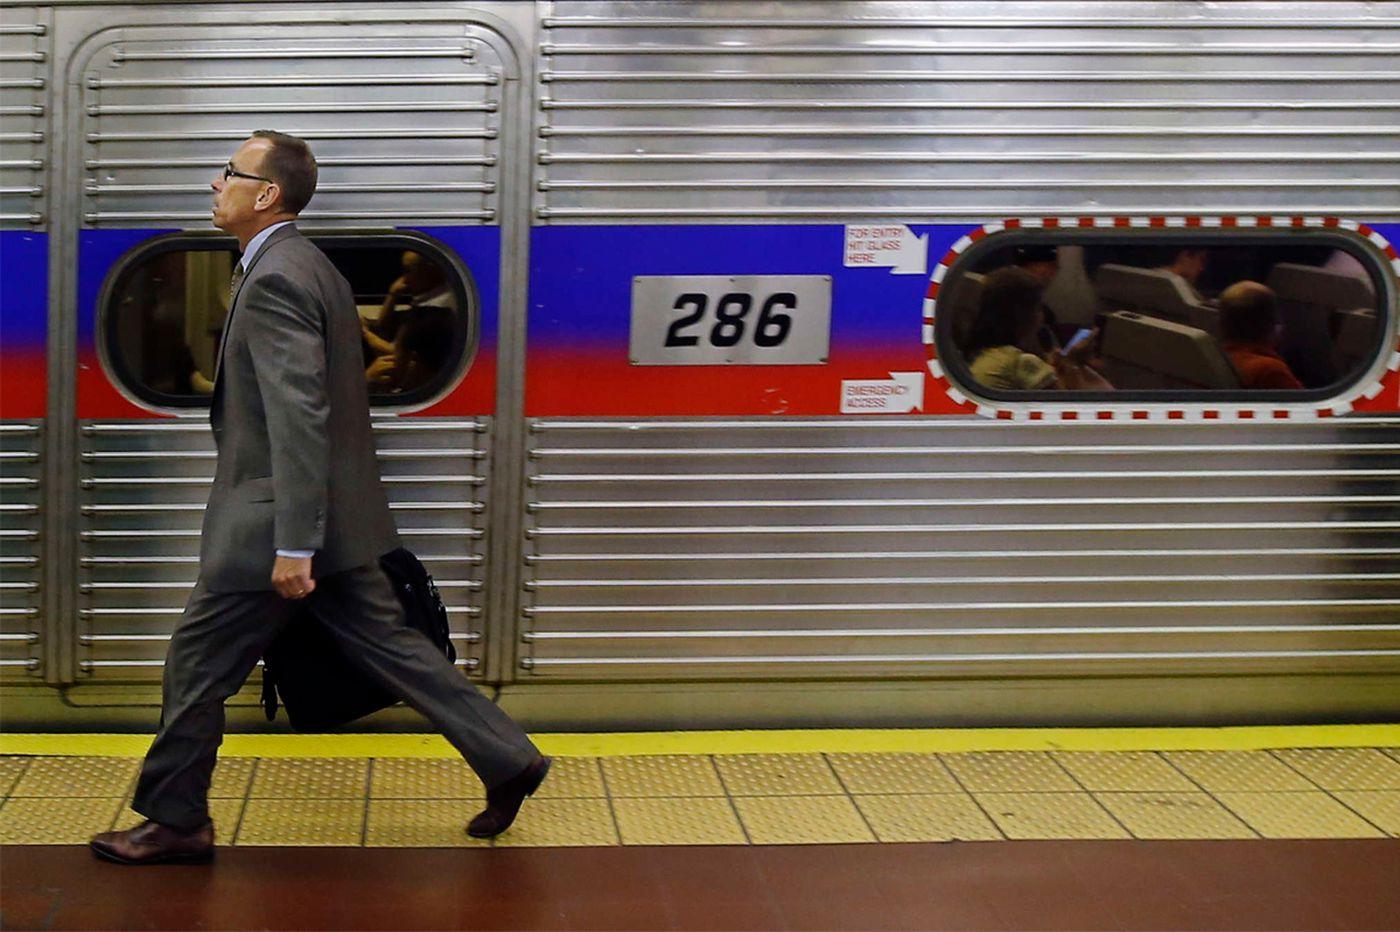 Inquirer editorial: SEPTA - Get Regional Rail service on track